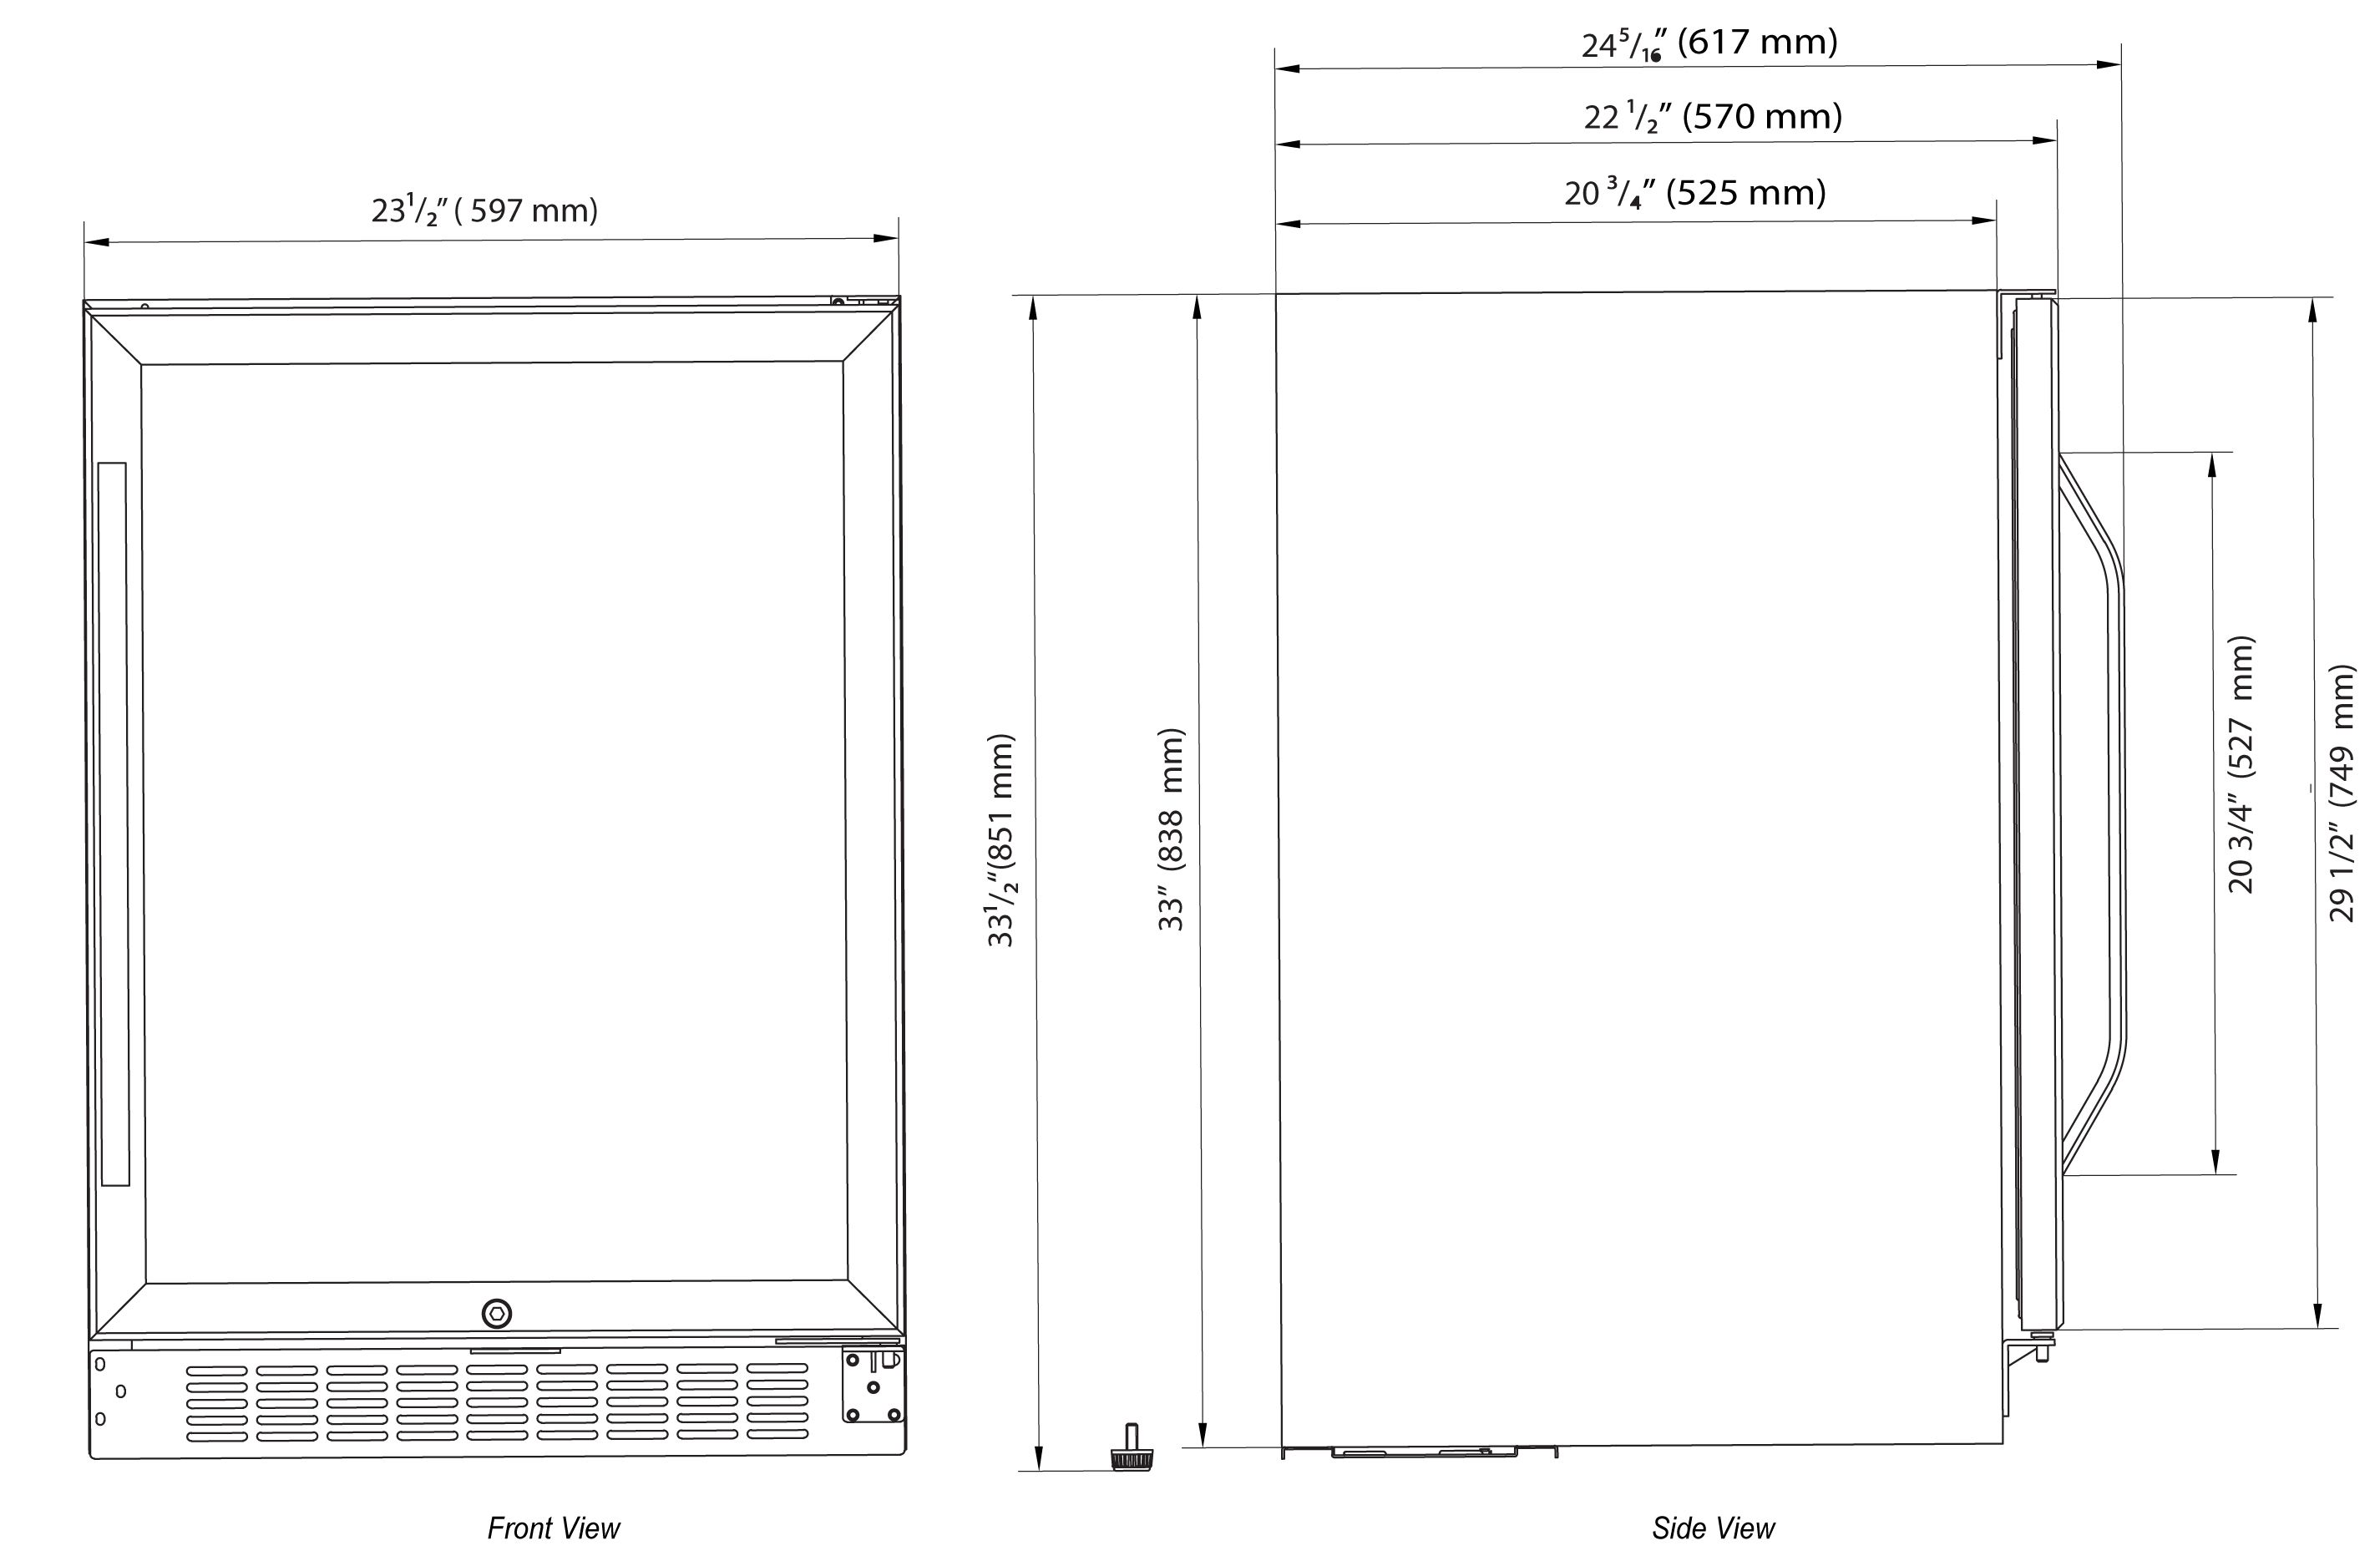 edgestar wiring diagram wiring diagram filteredgestar wiring diagram wiring diagram data val edgestar wiring diagram [ 2850 x 1875 Pixel ]